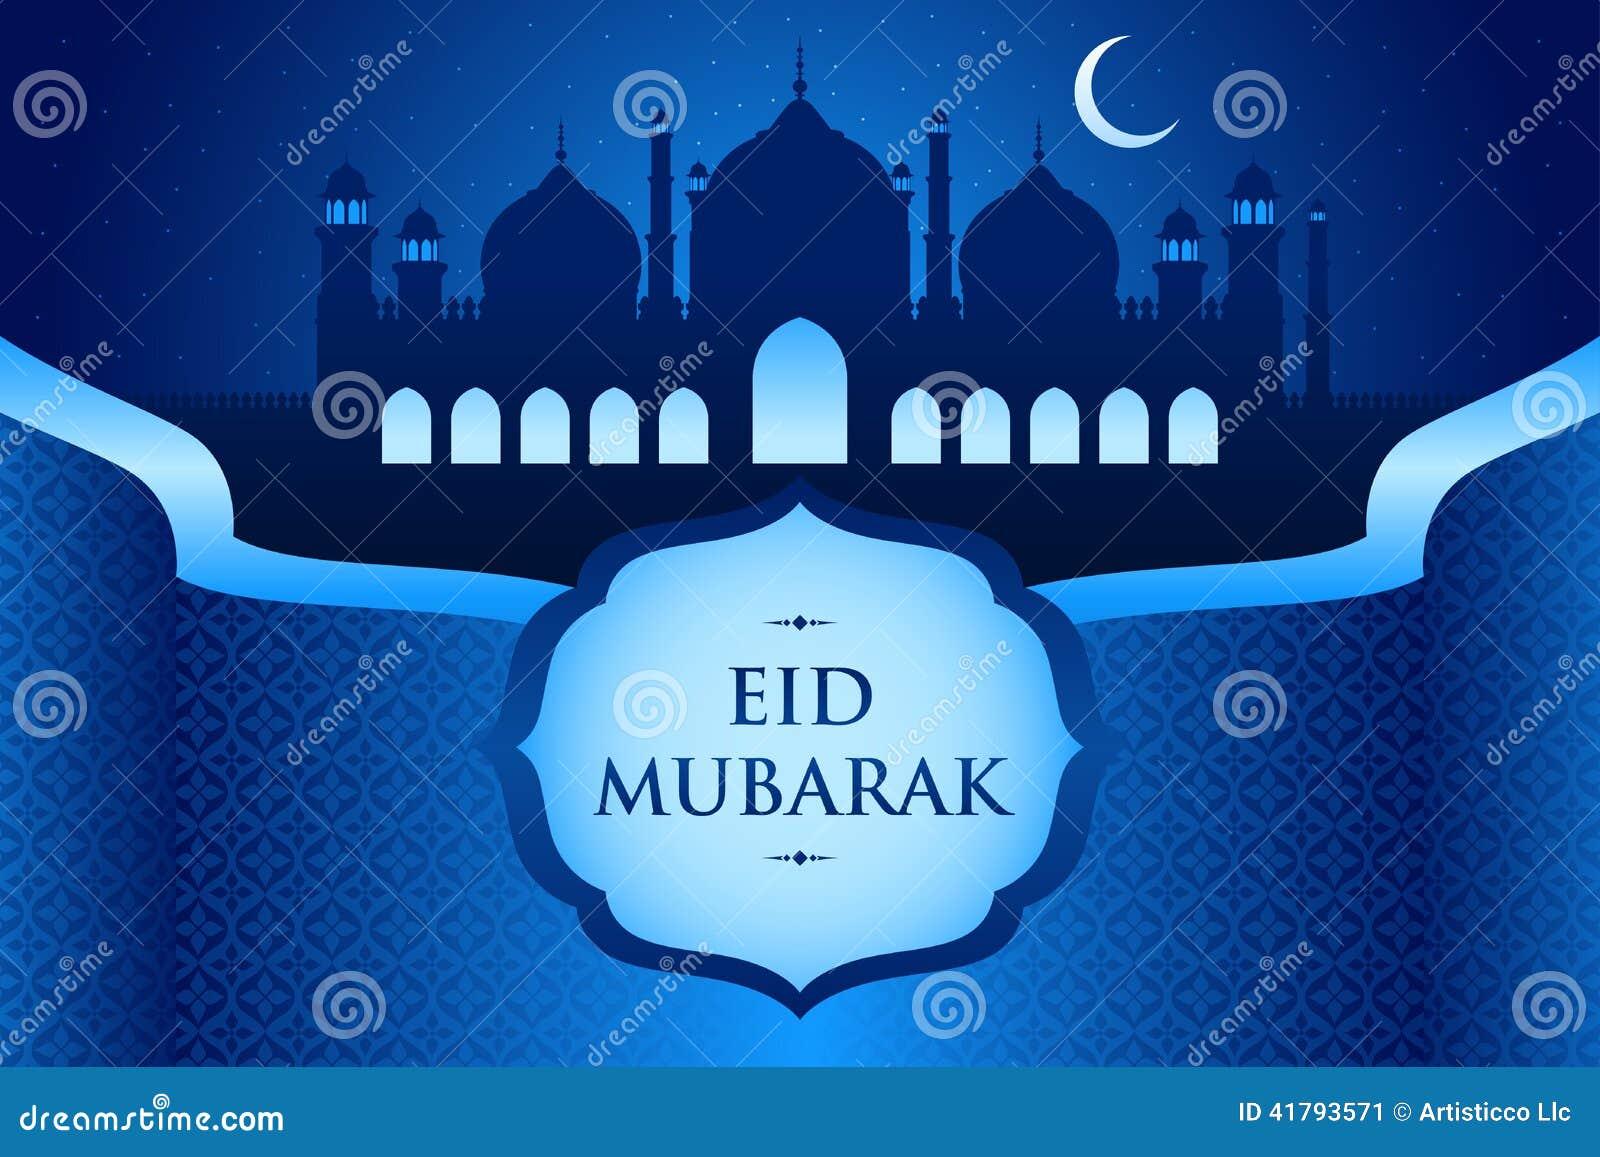 Download El Kabir Eid Al-Fitr Greeting - eid-al-fitr-greeting-card-vector-illustration-design-41793571  HD_391456 .jpg